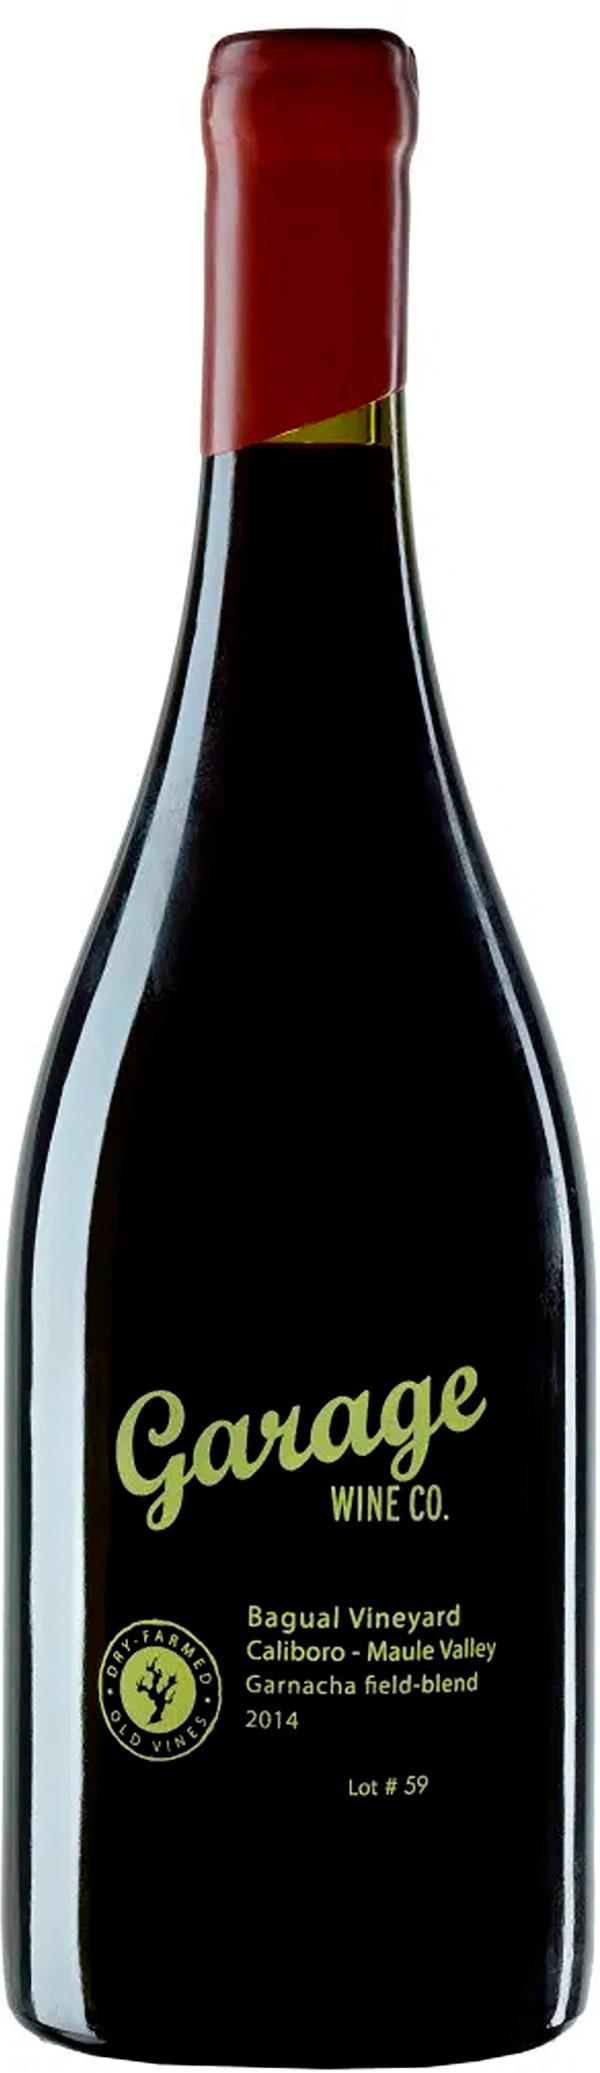 Garage Wine Co. Bagual Vineyard Garnacha Field Blend 2014